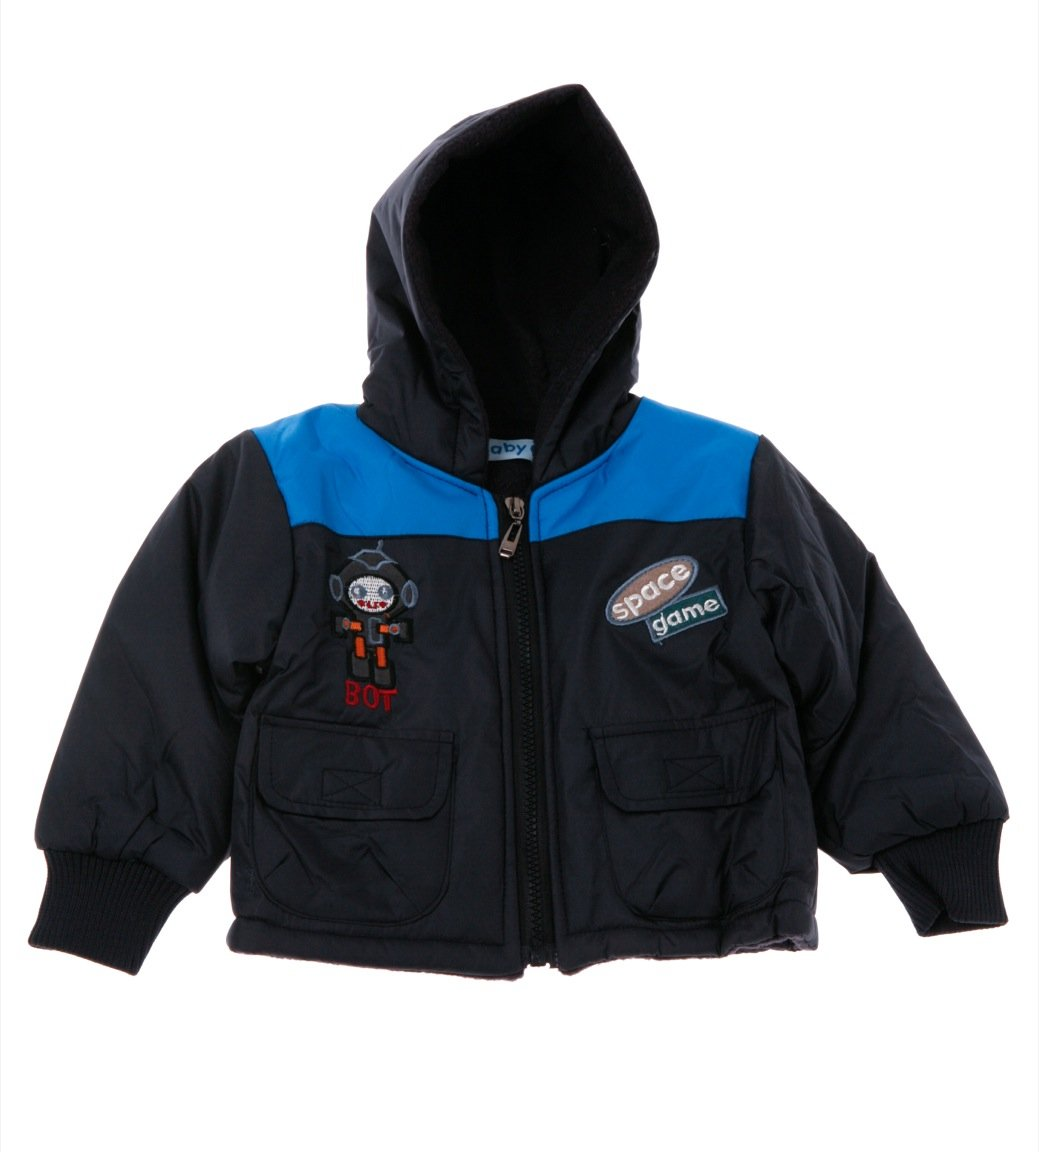 Baby C παιδικό μπουφάν «Space Game» - Παιδικά ρούχα 5345d0fbaff